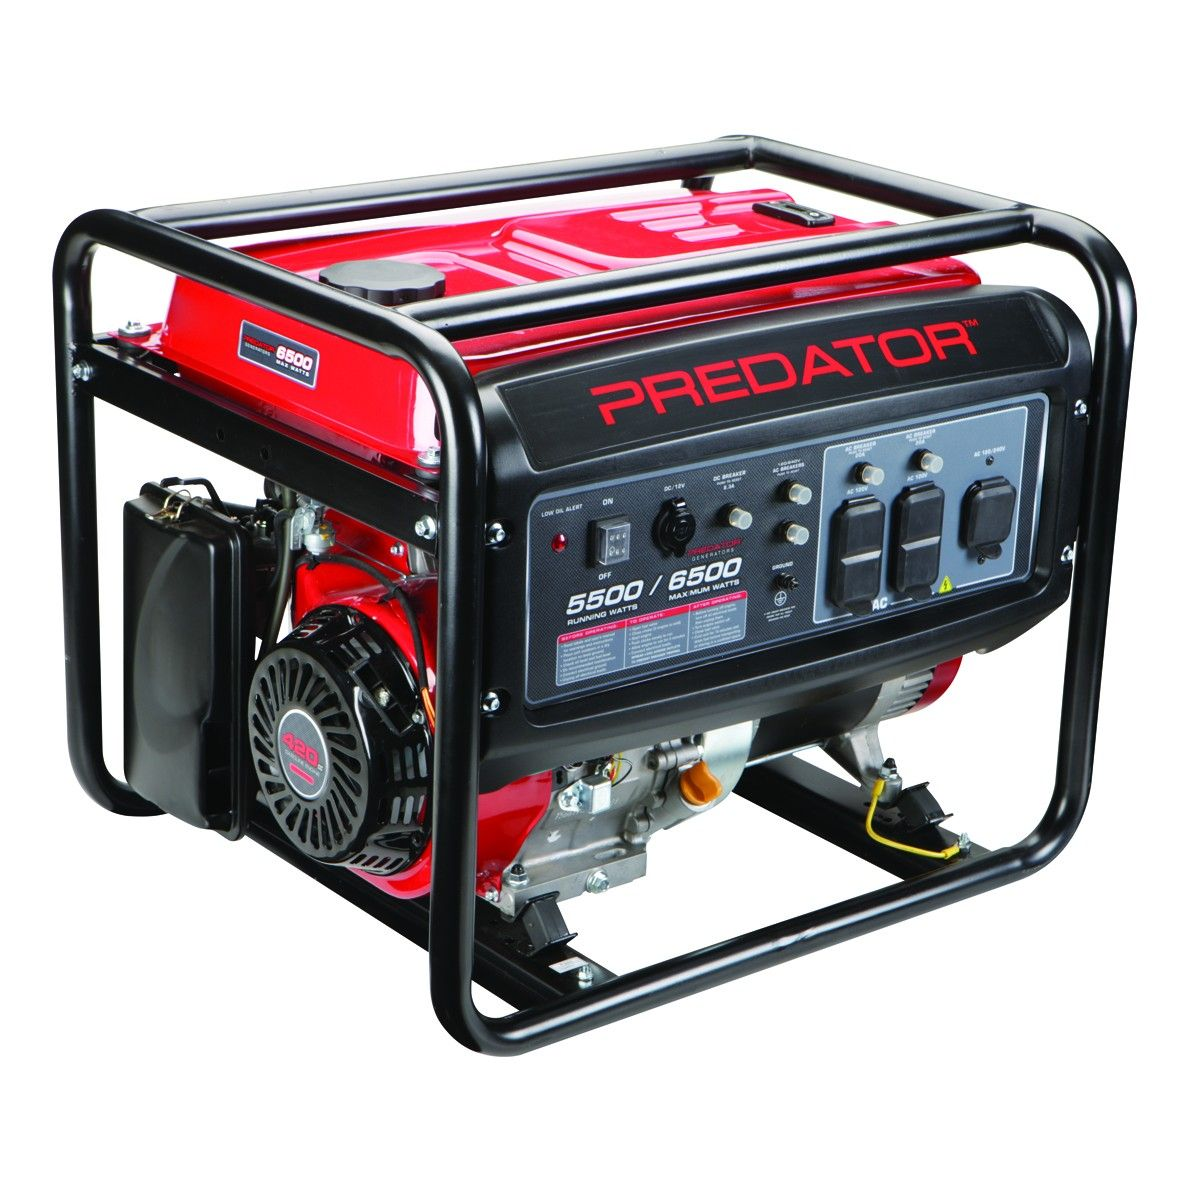 6500 Peak 5500 Running Watts 13 Hp 420cc Generator Carb